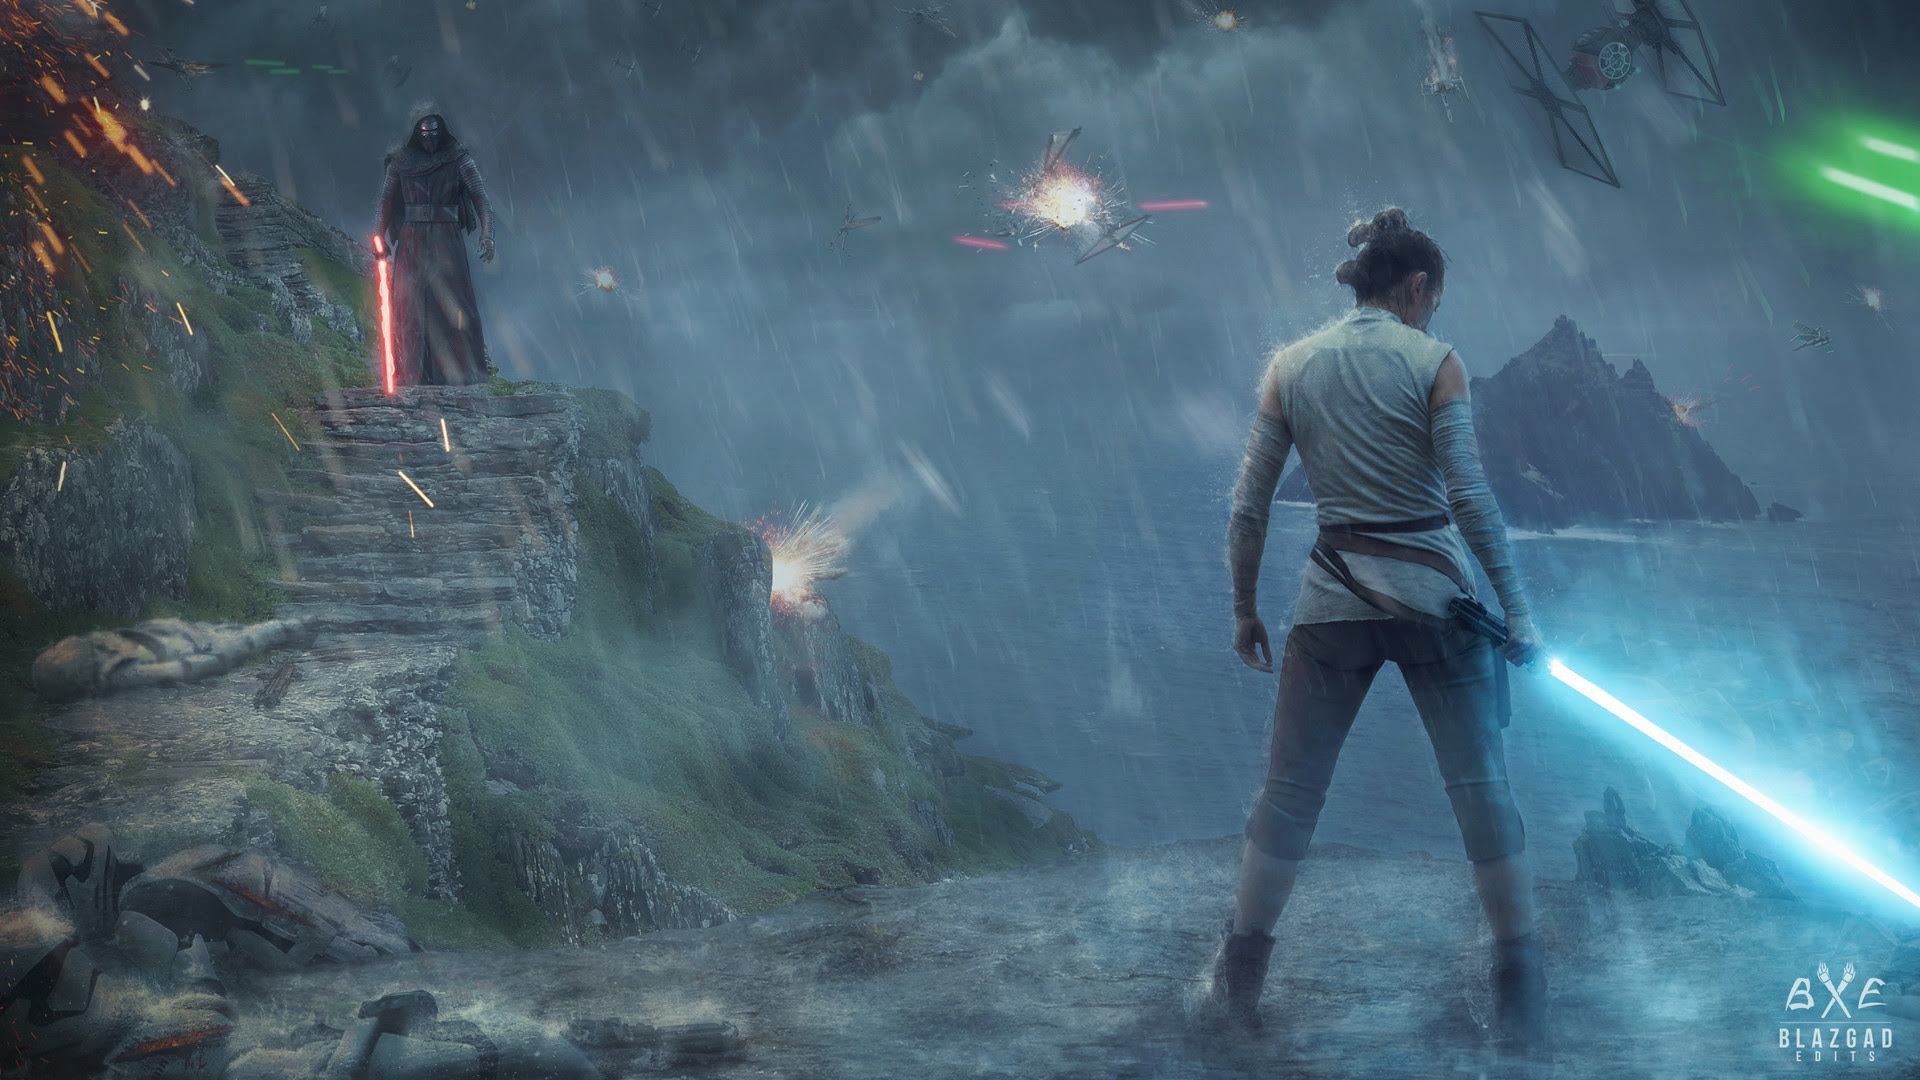 Star Wars Rey Wallpaper Hd 63 Images